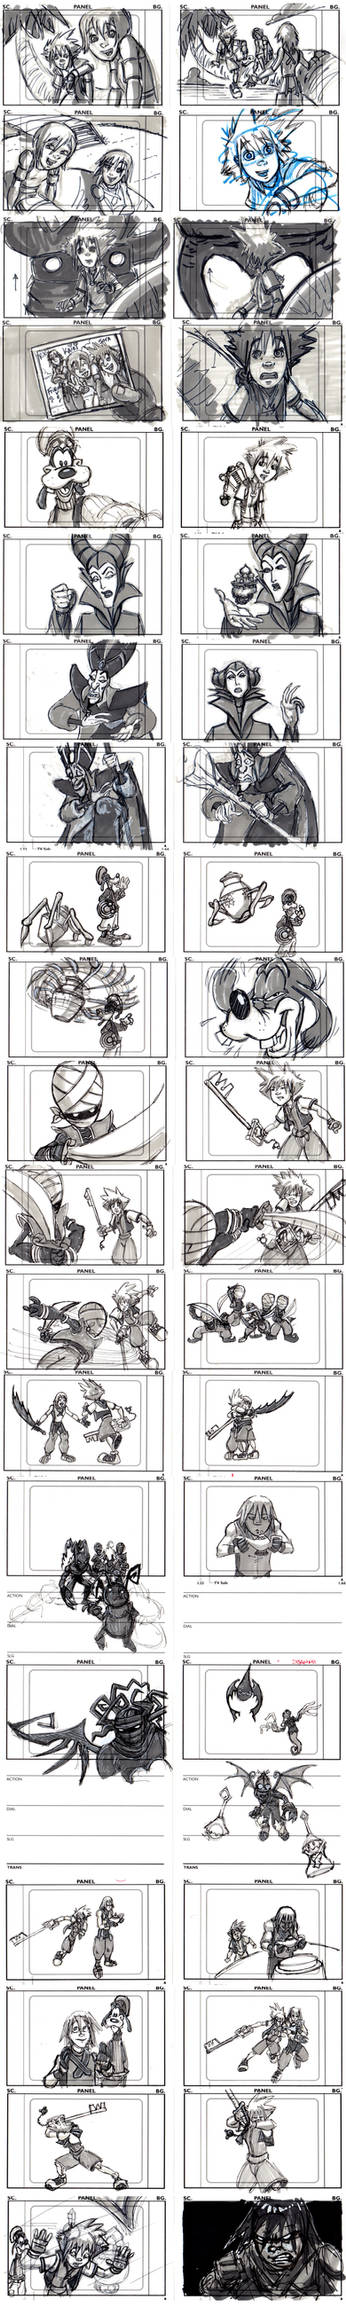 Kingdom Hearts Pilot Board